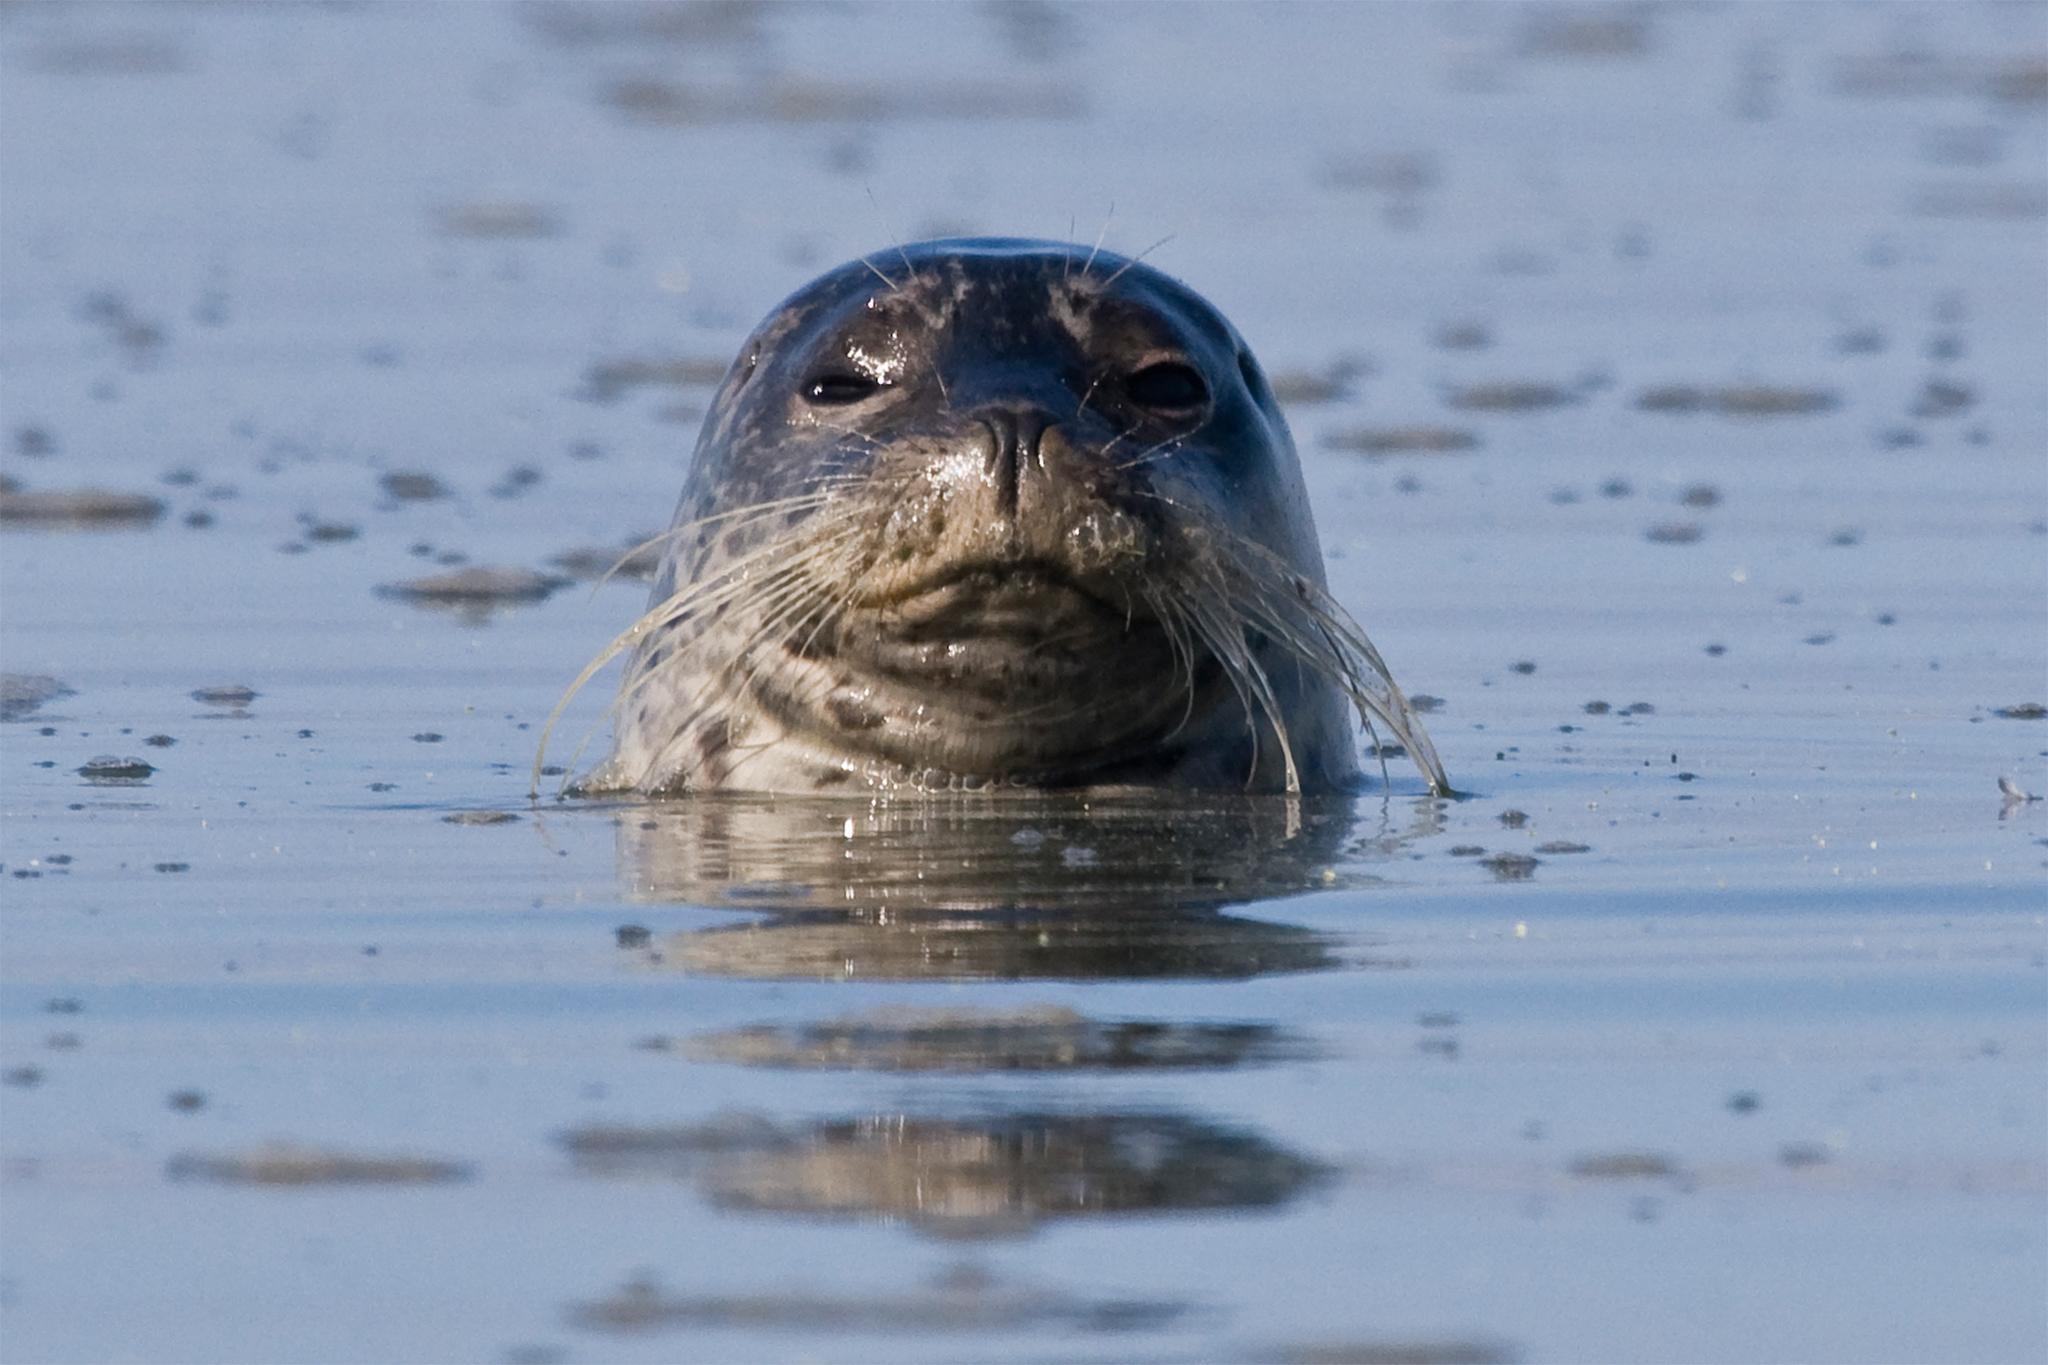 NYC Audubon Winter EcoCruise: Seals and Wildlife of NY Harbor